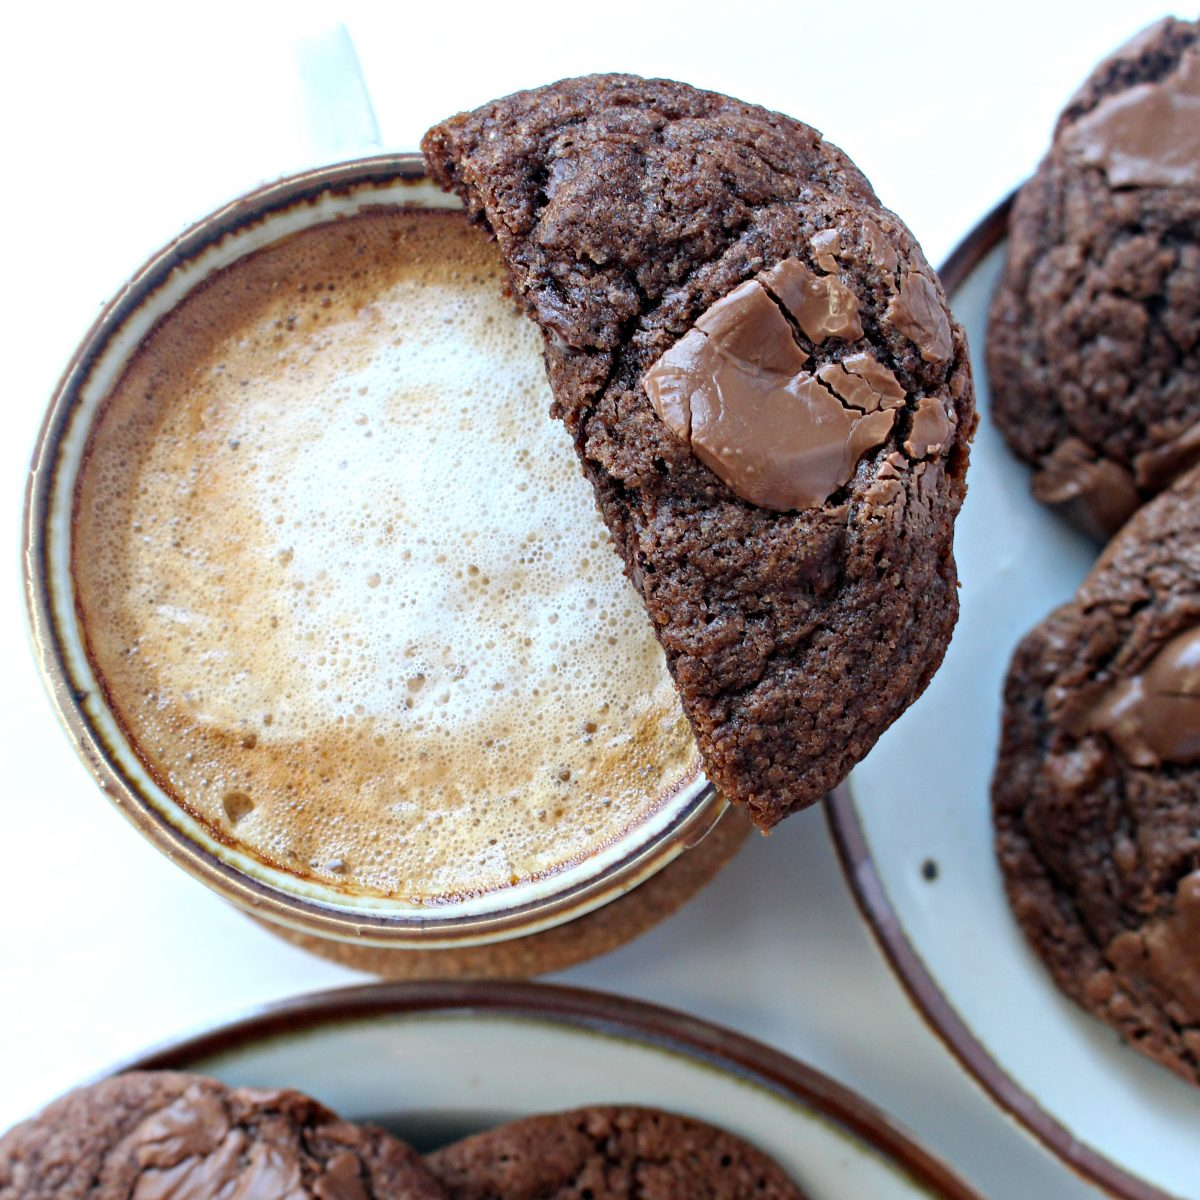 Half dark chocolate cookie balanced on rim of coffee cup.